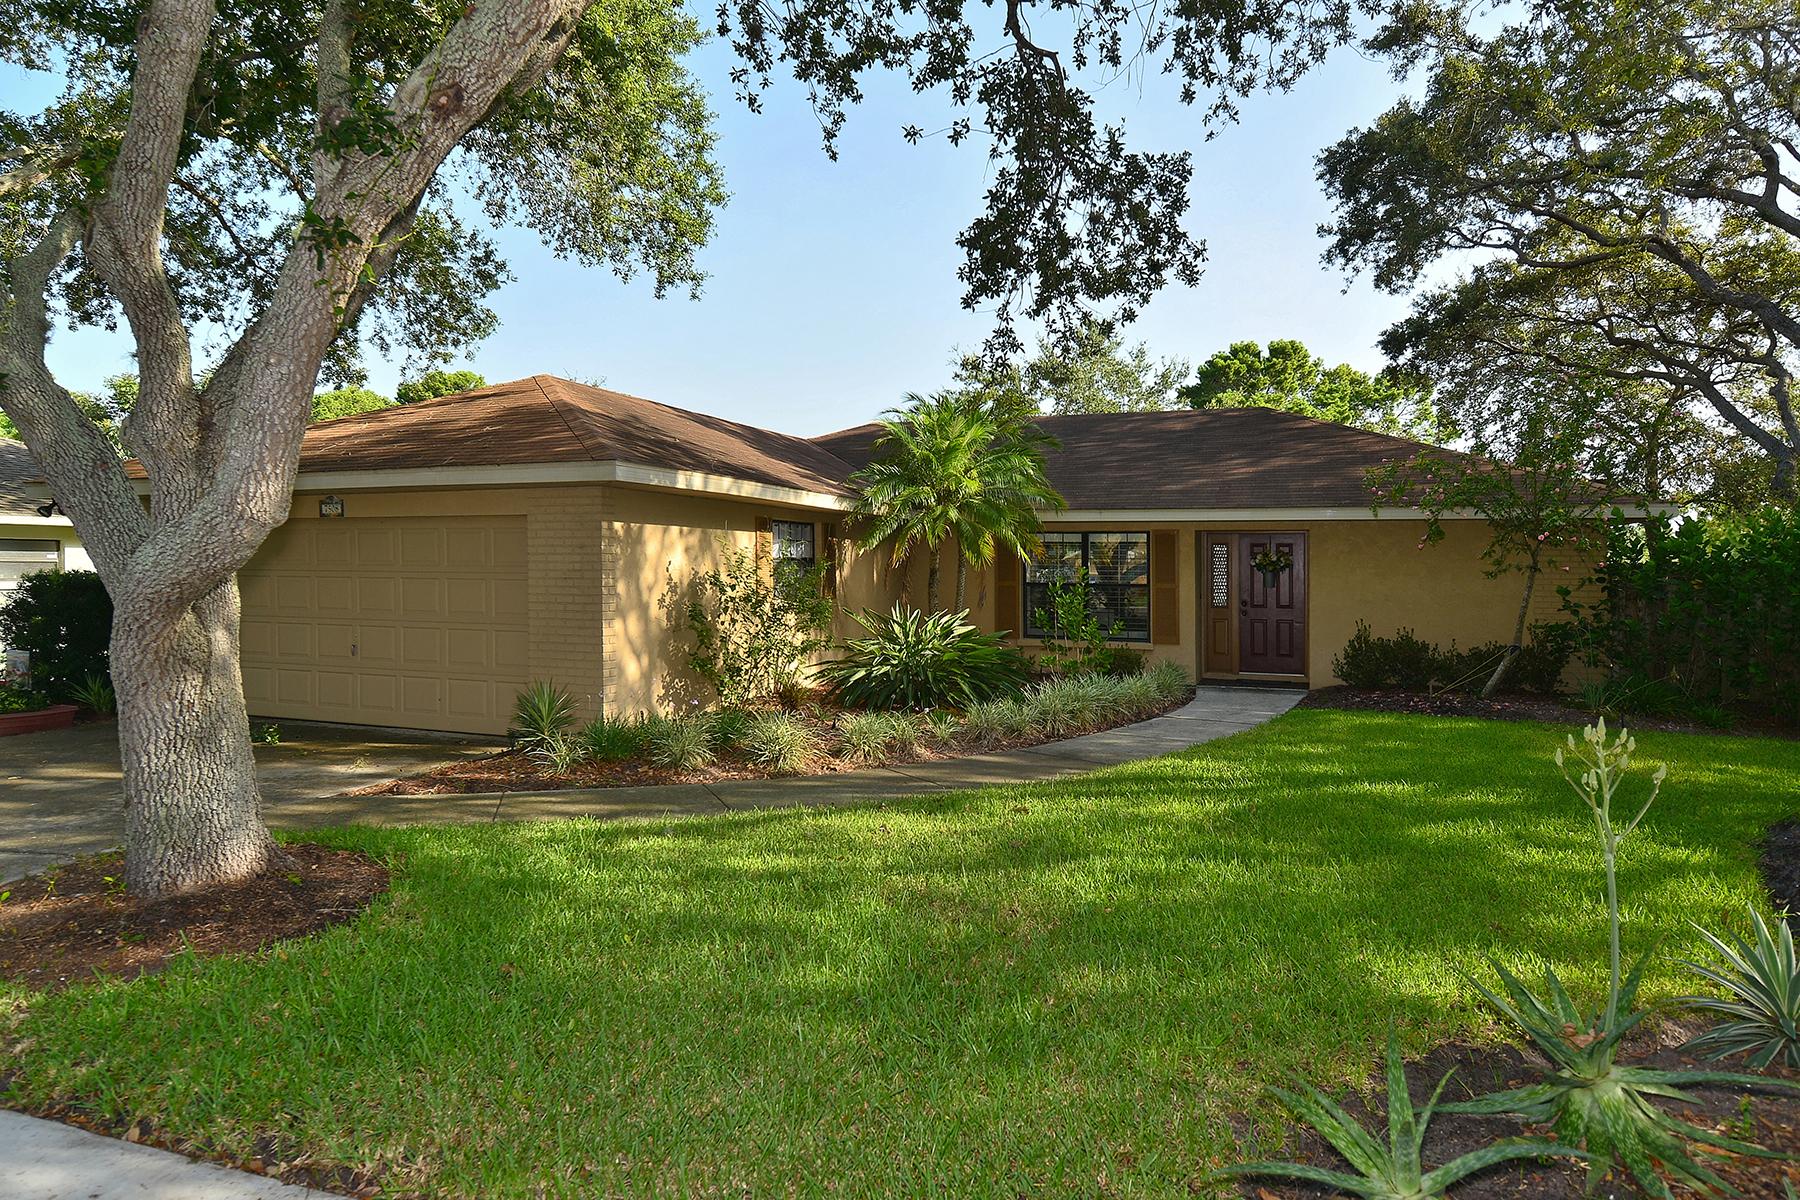 Moradia para Venda às BRADENTON 7508 4th Avenue Dr NW Bradenton, Florida 34209 Estados Unidos